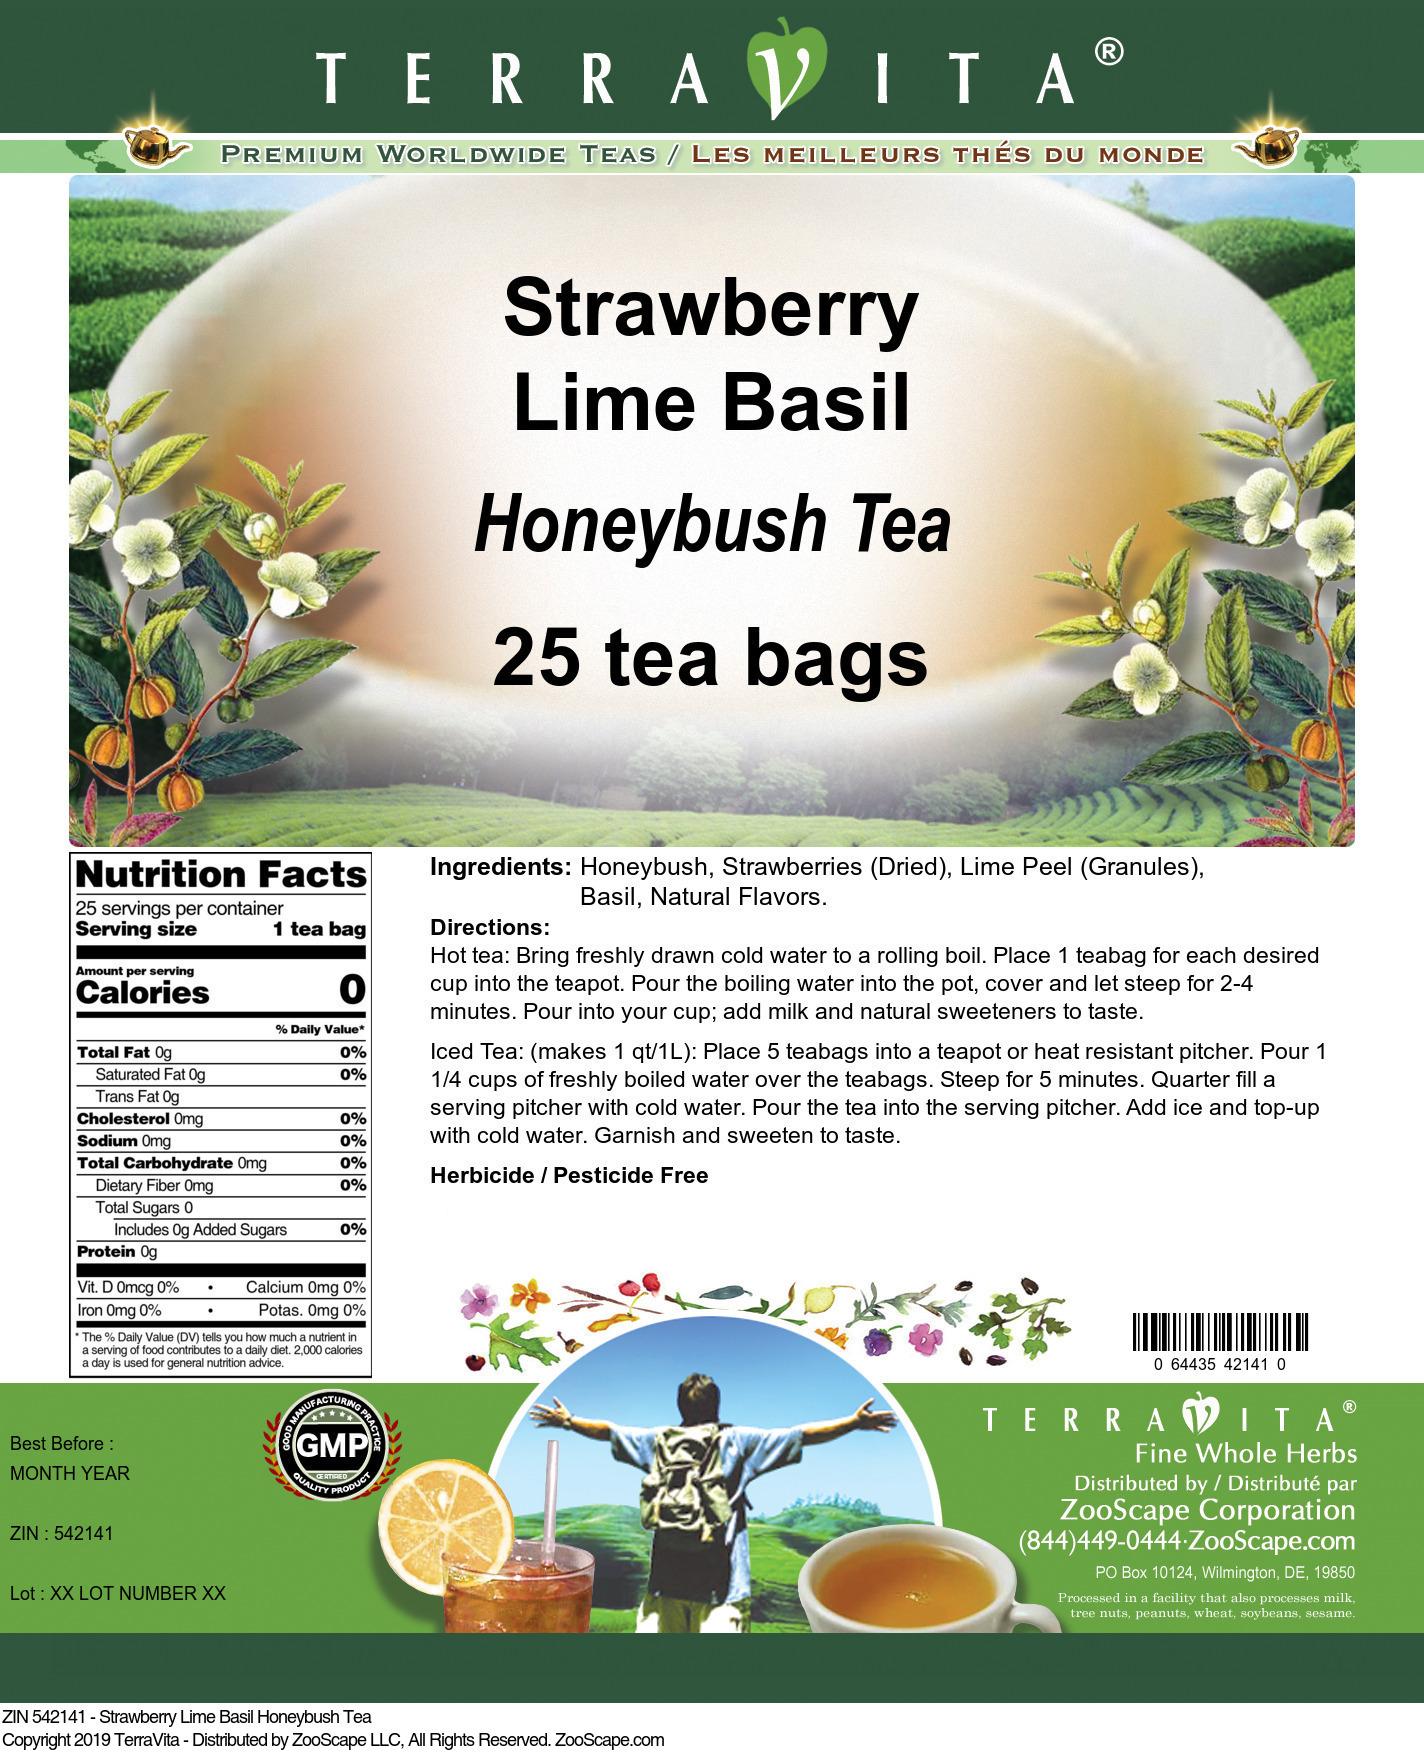 Strawberry Lime Basil Honeybush Tea